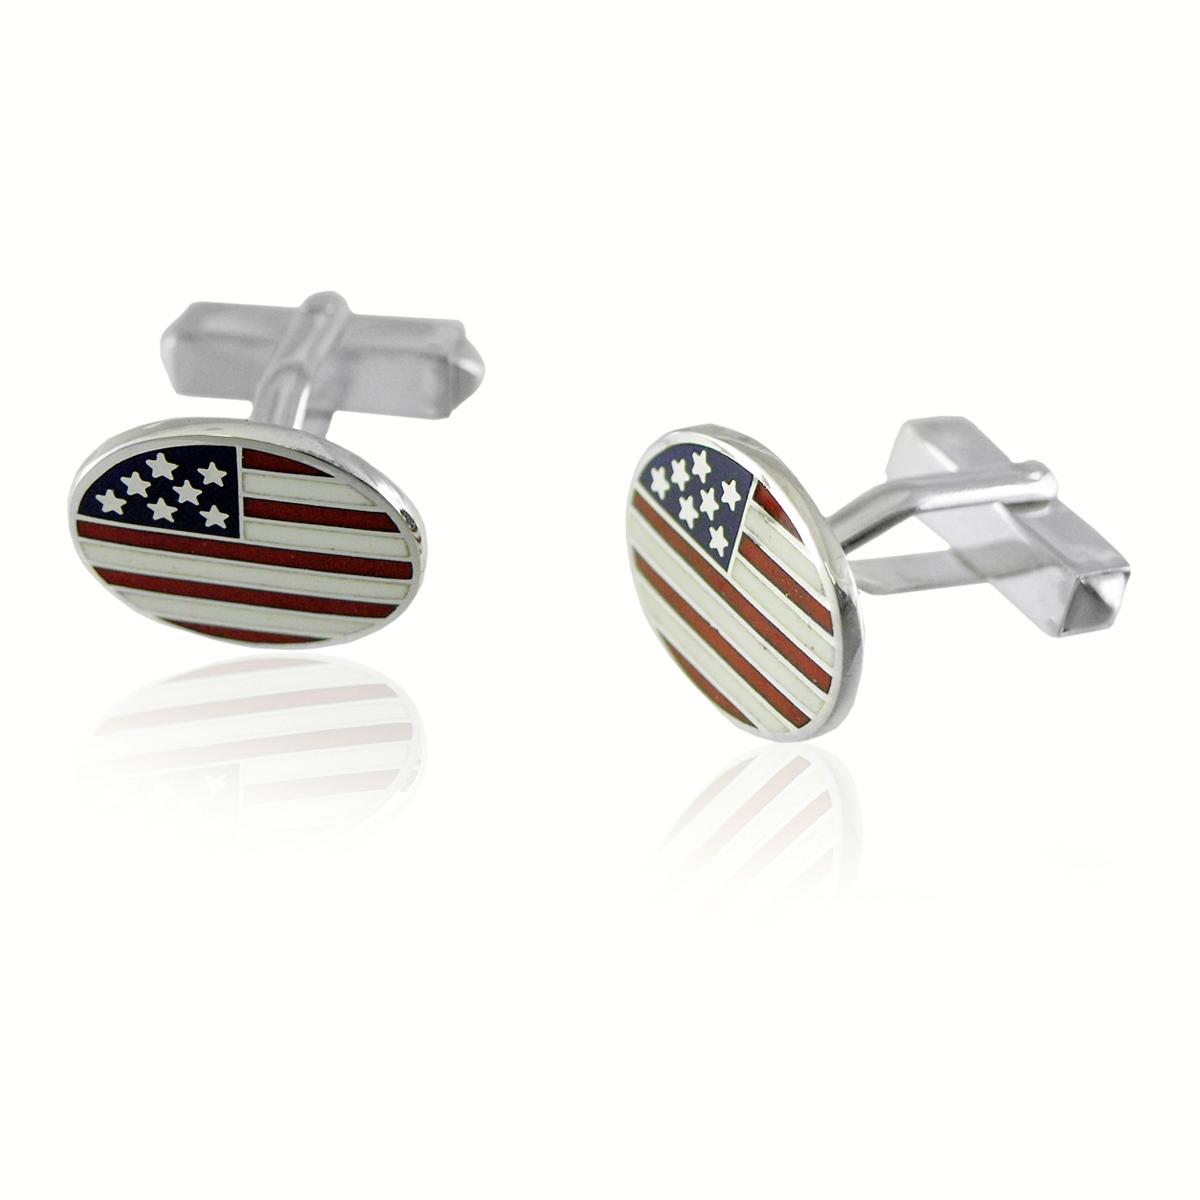 Sterling Silver Oval American Flag Cufflinks Cufflinks Depot